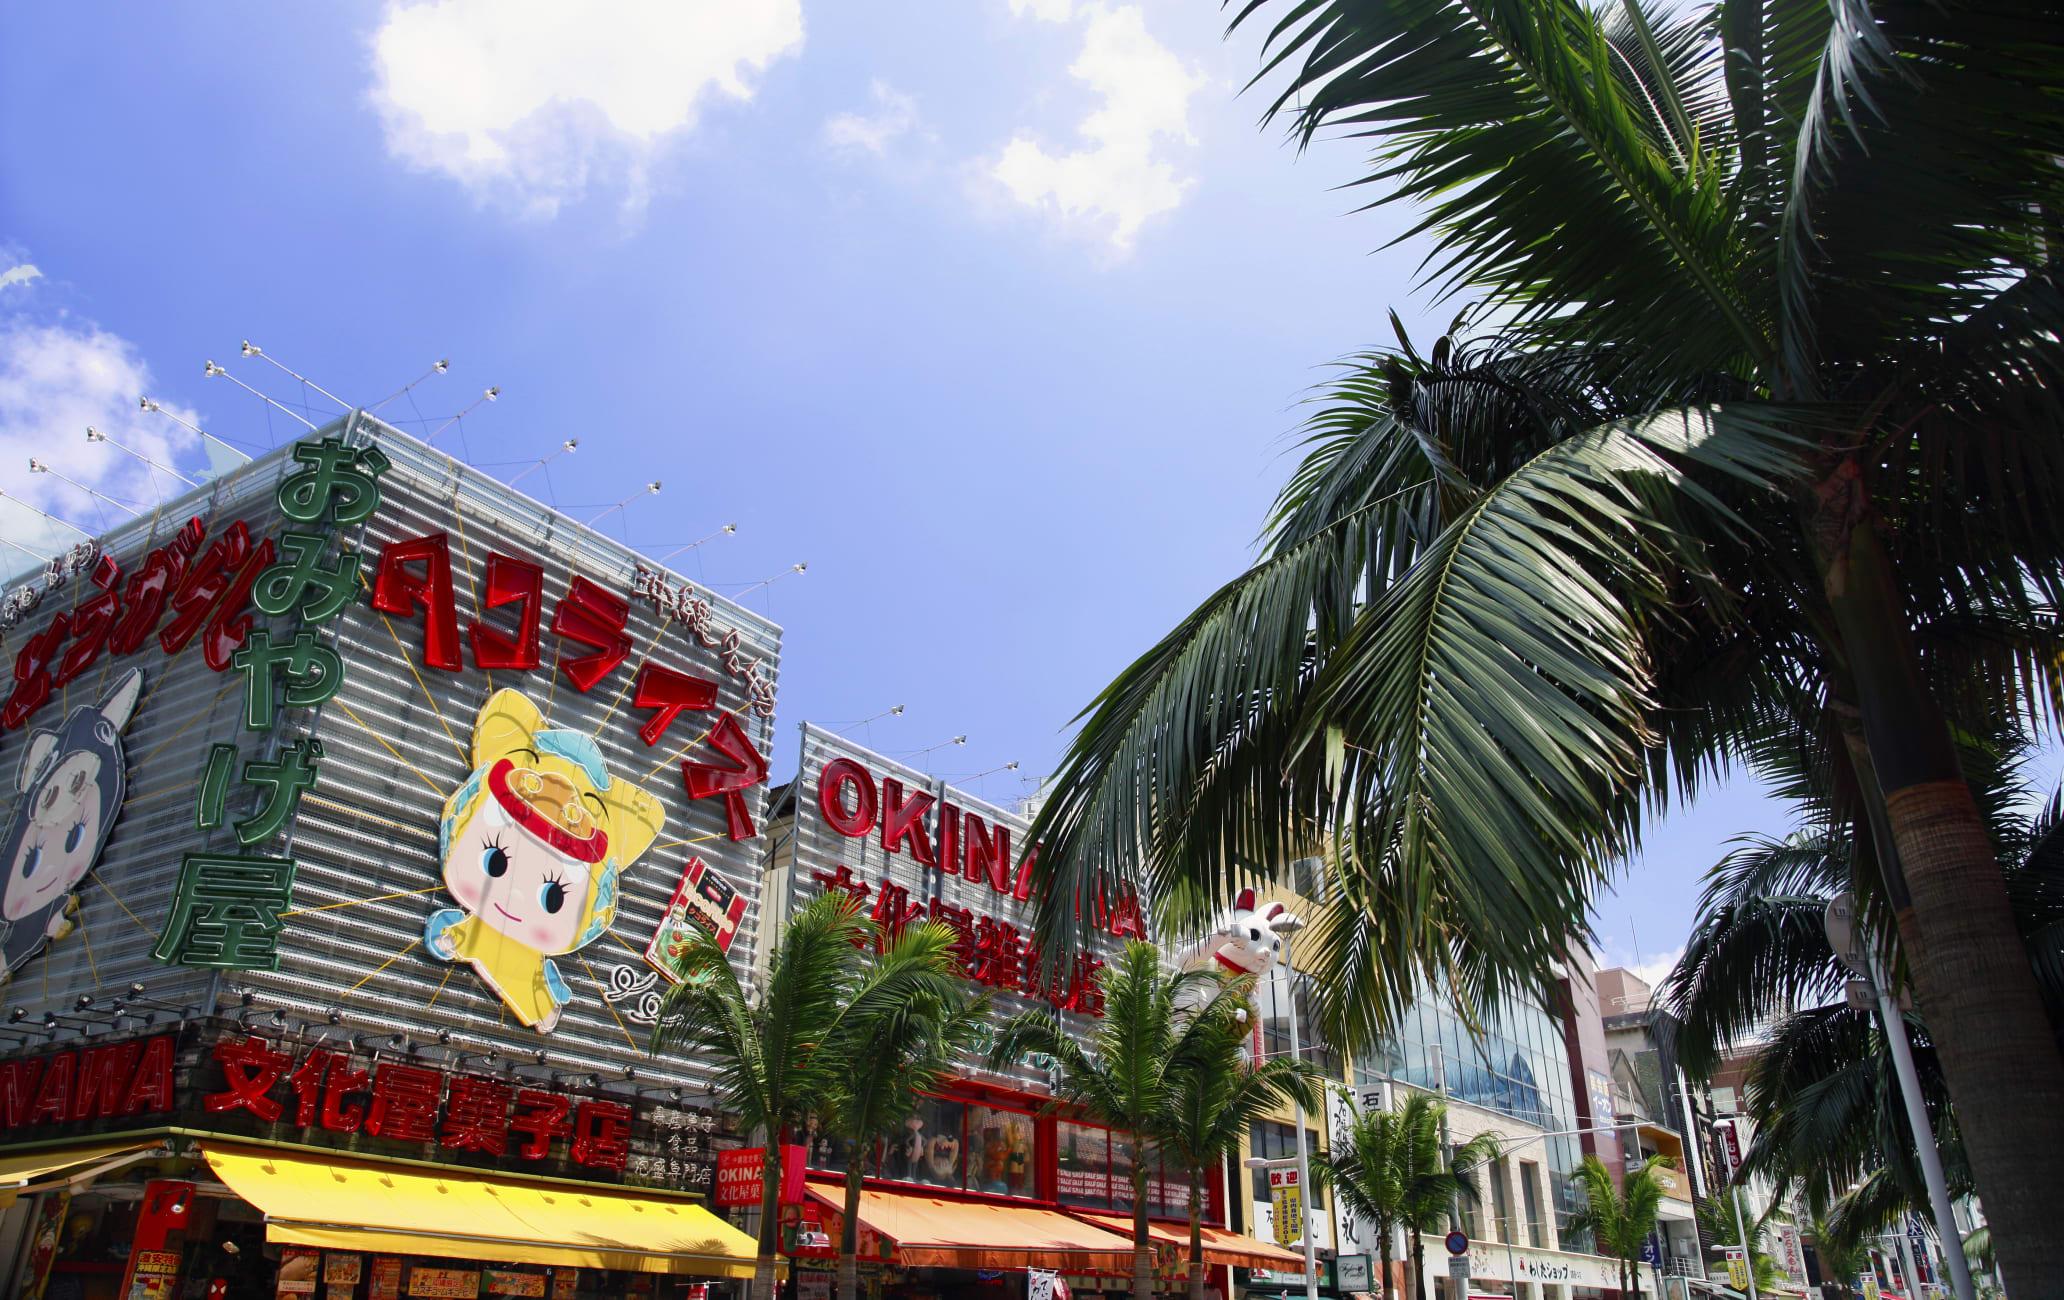 Central Okinawa